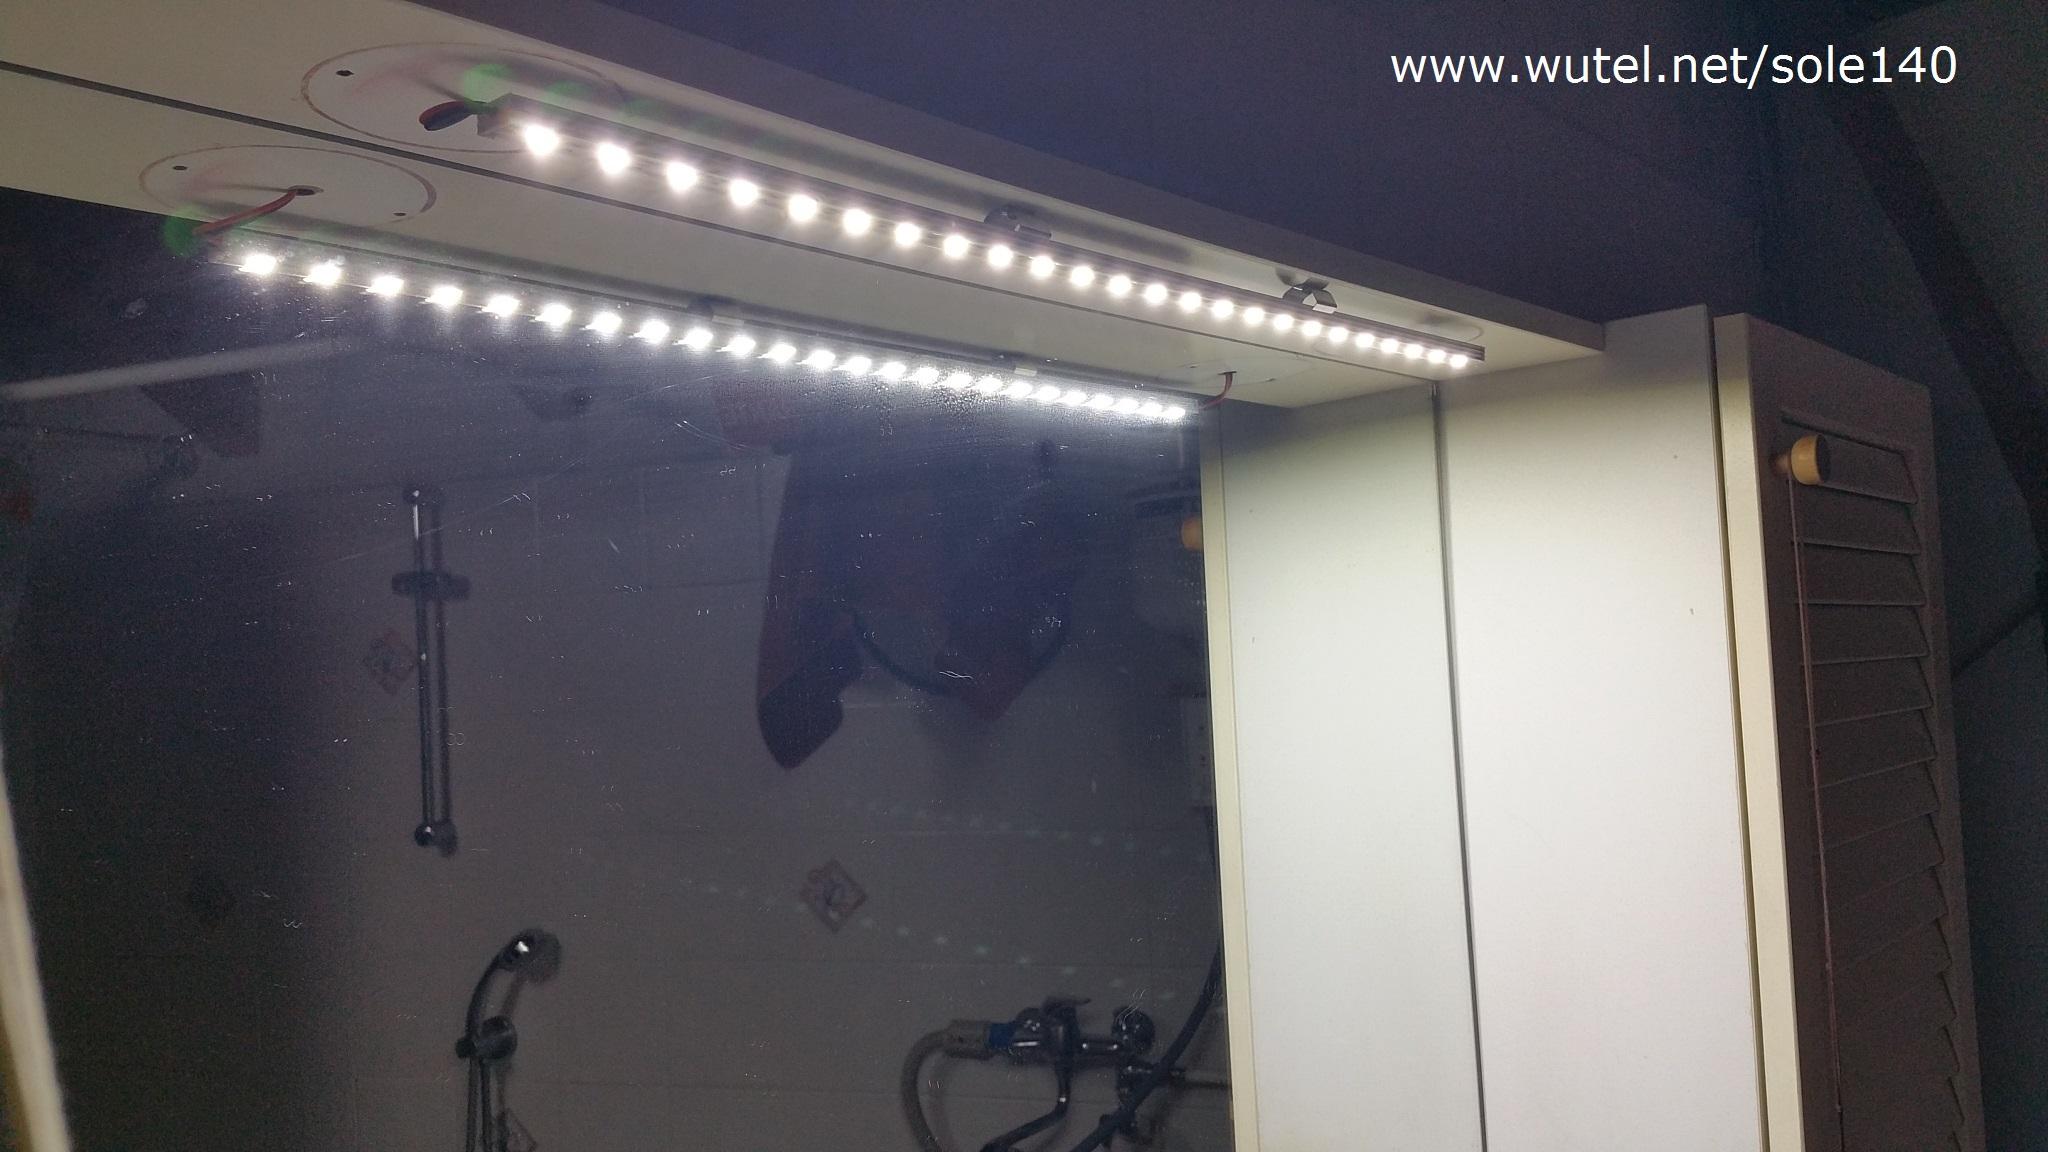 Illuminazione barra led : Www.wutel.net/sole140